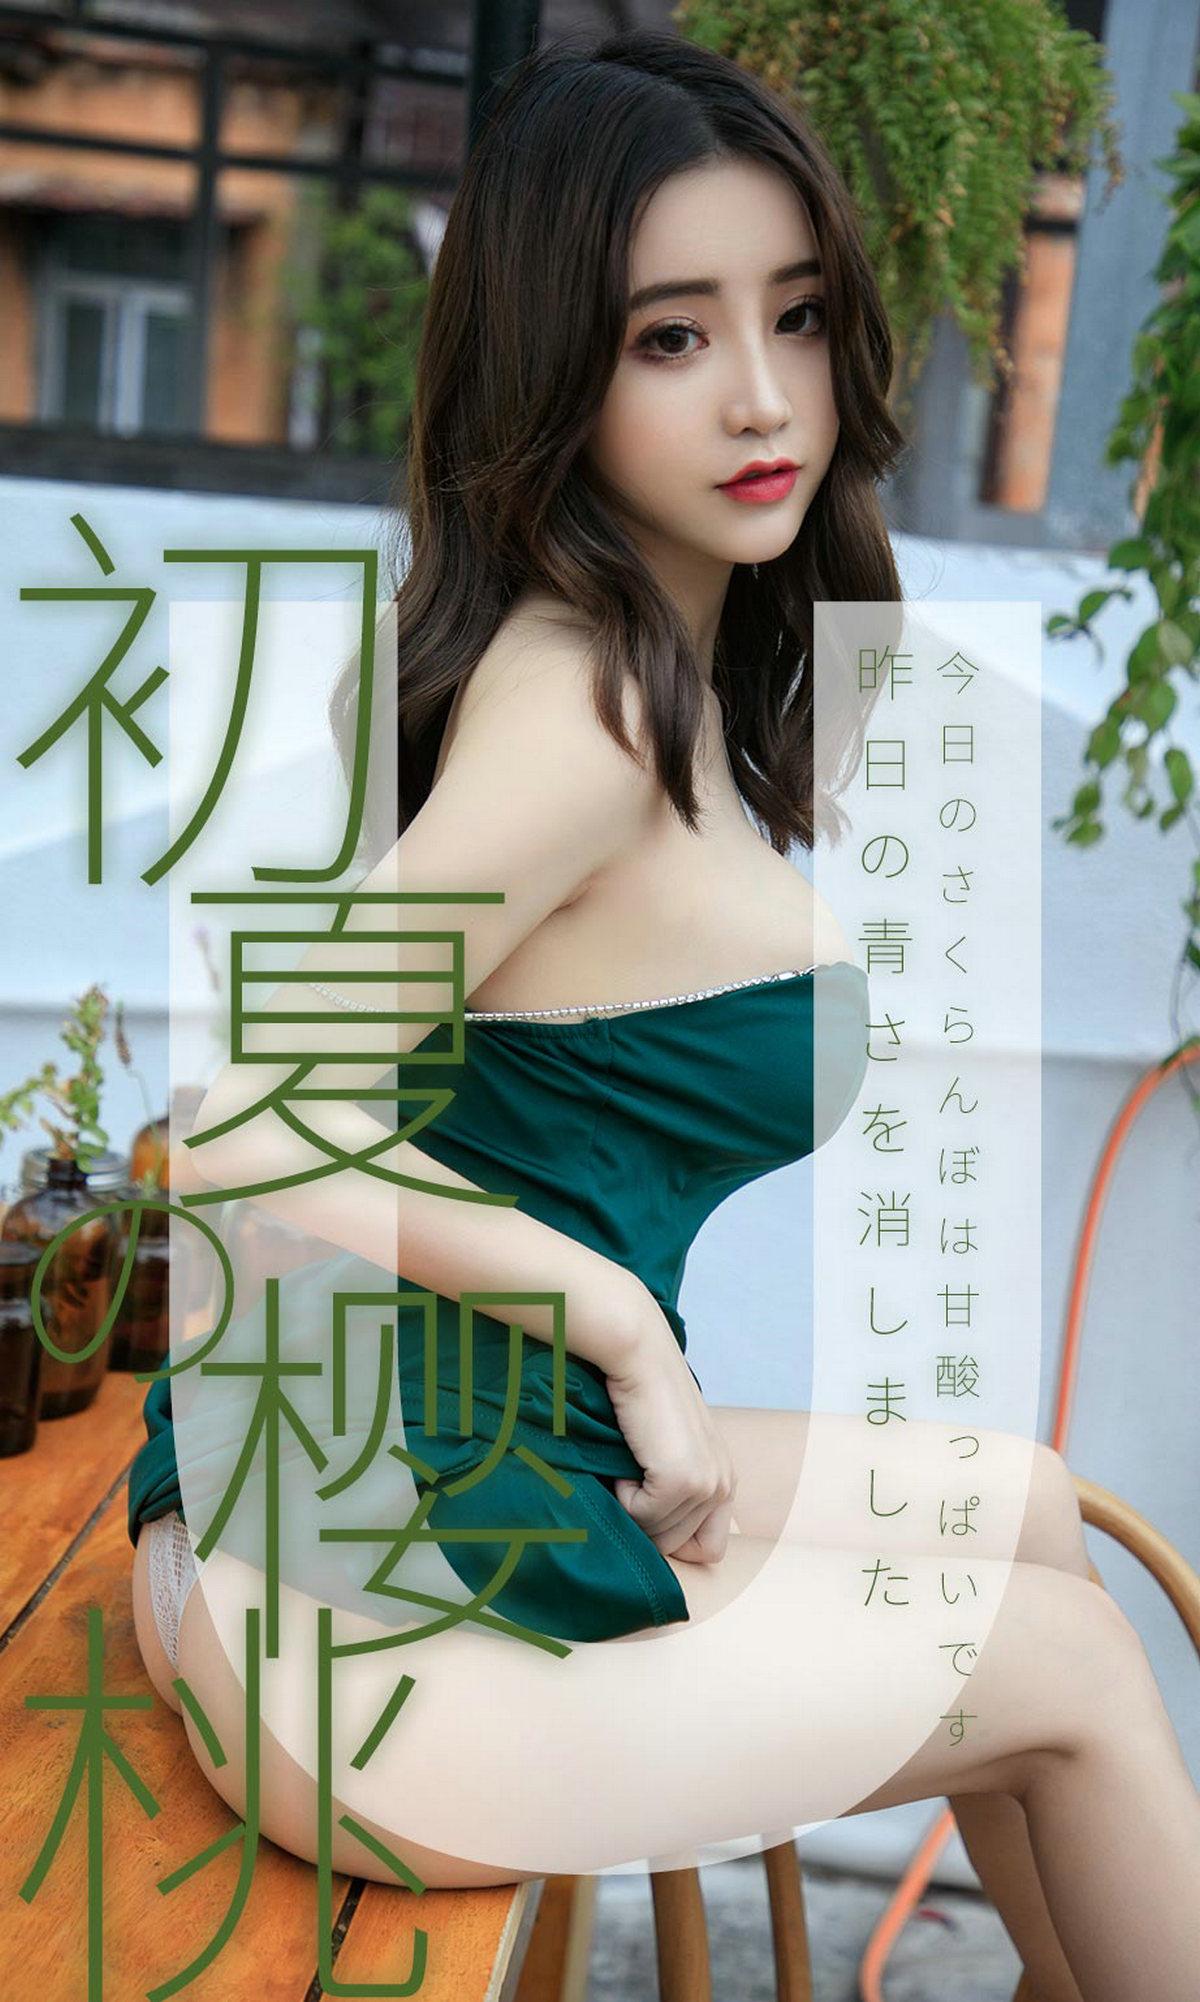 [Ugirls]爱尤物 No.1433 初夏的樱桃 绯月樱C